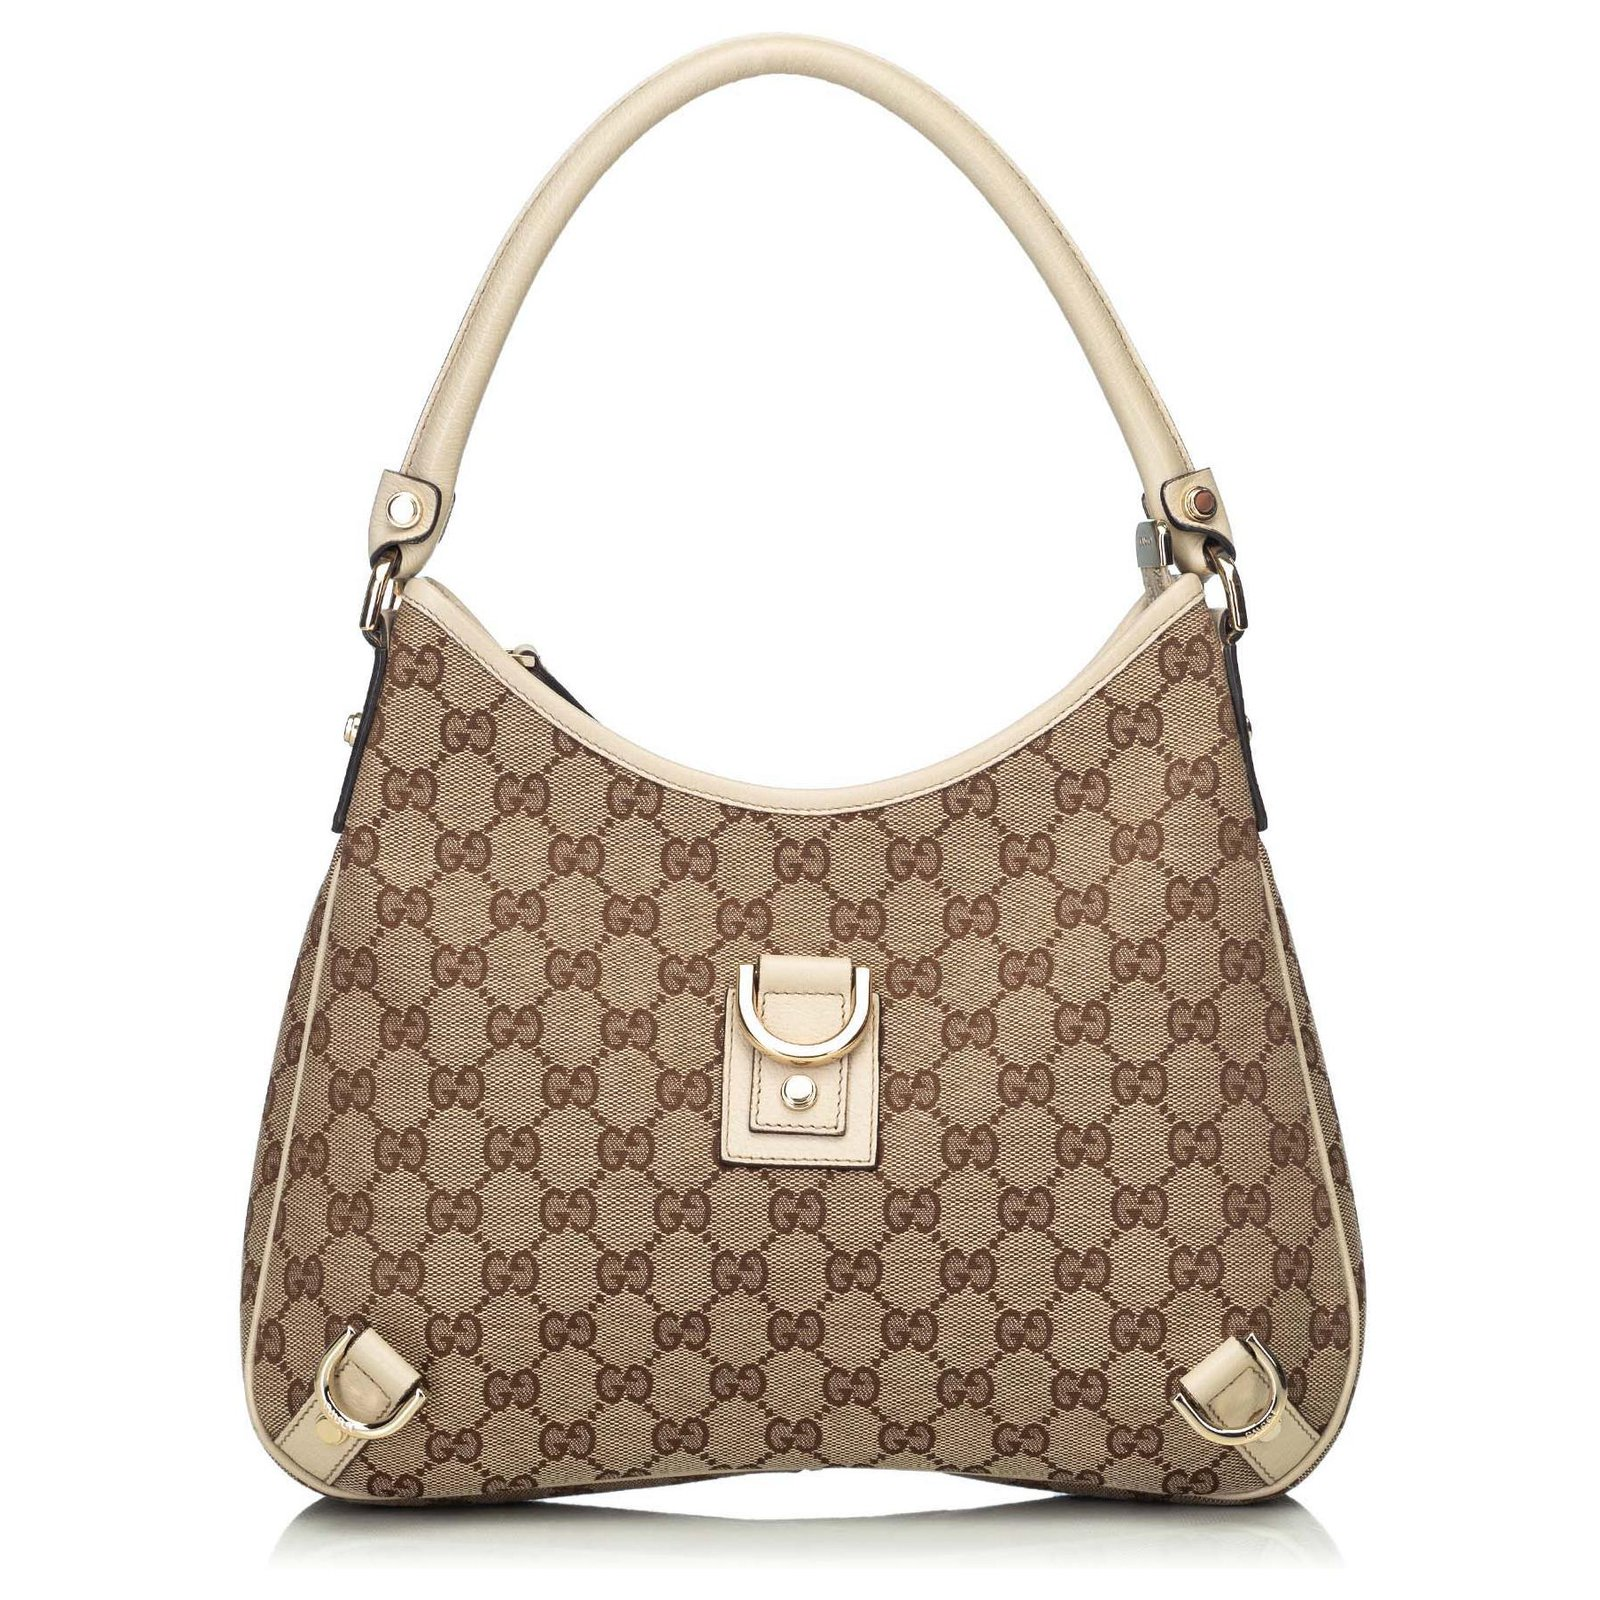 e969843fc27bf9 Gucci Gucci Brown GG Jacquard Abbey Hobo Bag Handbags Leather,Other,Cloth  Brown,